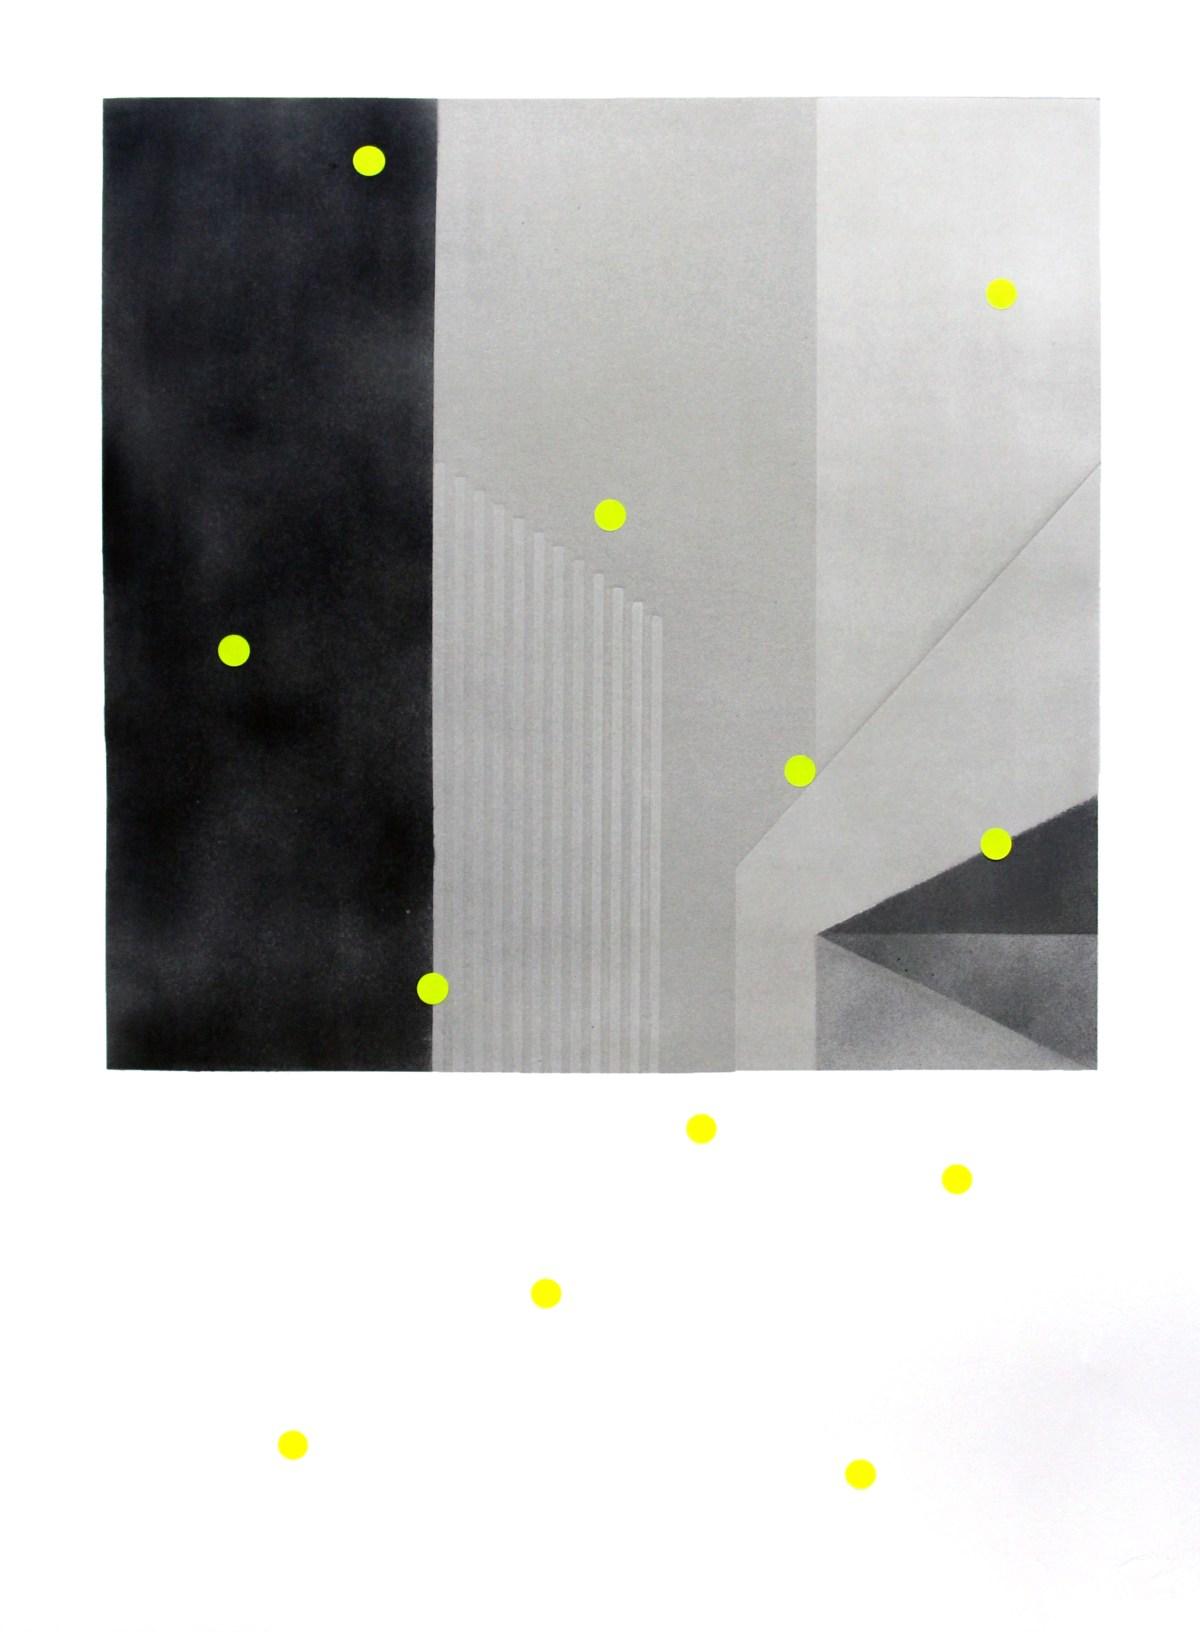 Carlos Vielma. Resonancia detalle de obra